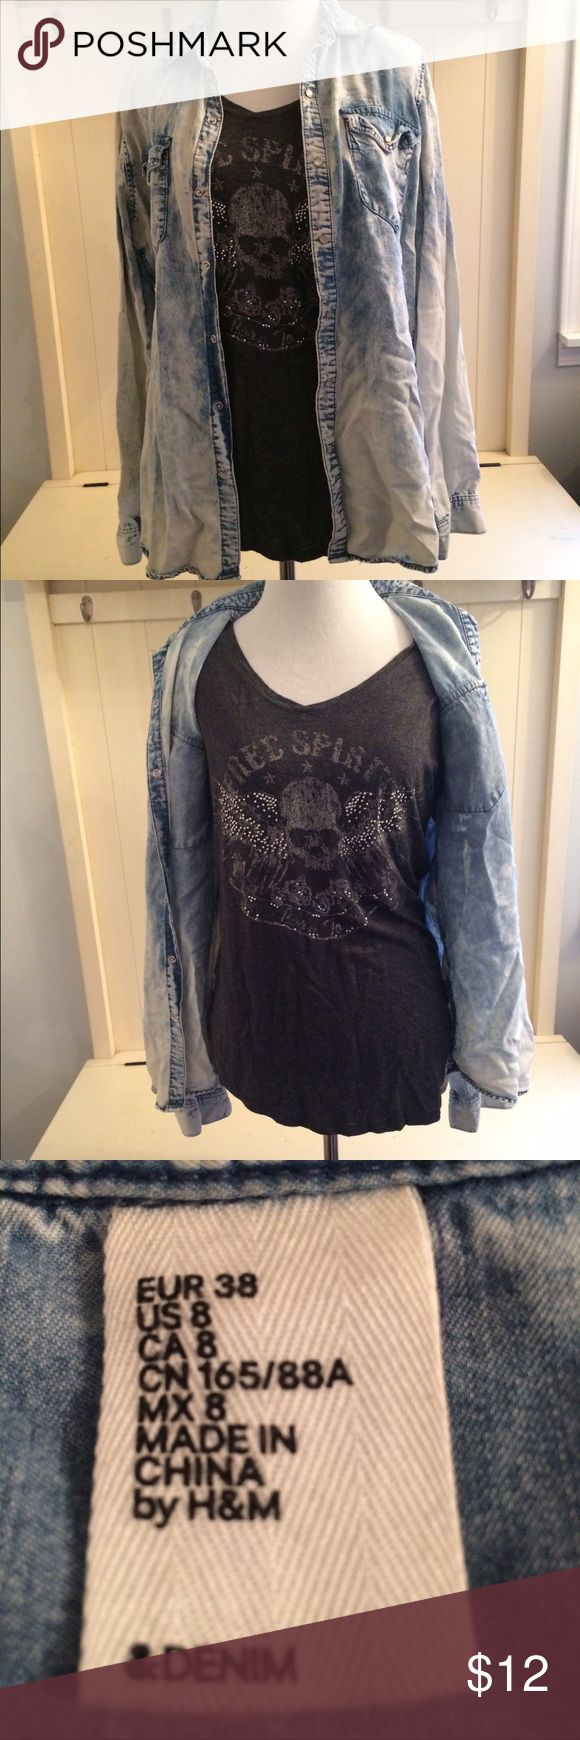 H&M denim shirt with Rock&Republic Tshirt medium H&M acid washed denim shirt sz 8 with Rock&Rebublic bling tshirt sz Medium. Two for the price of one! H&M/Rock&Republic Tops